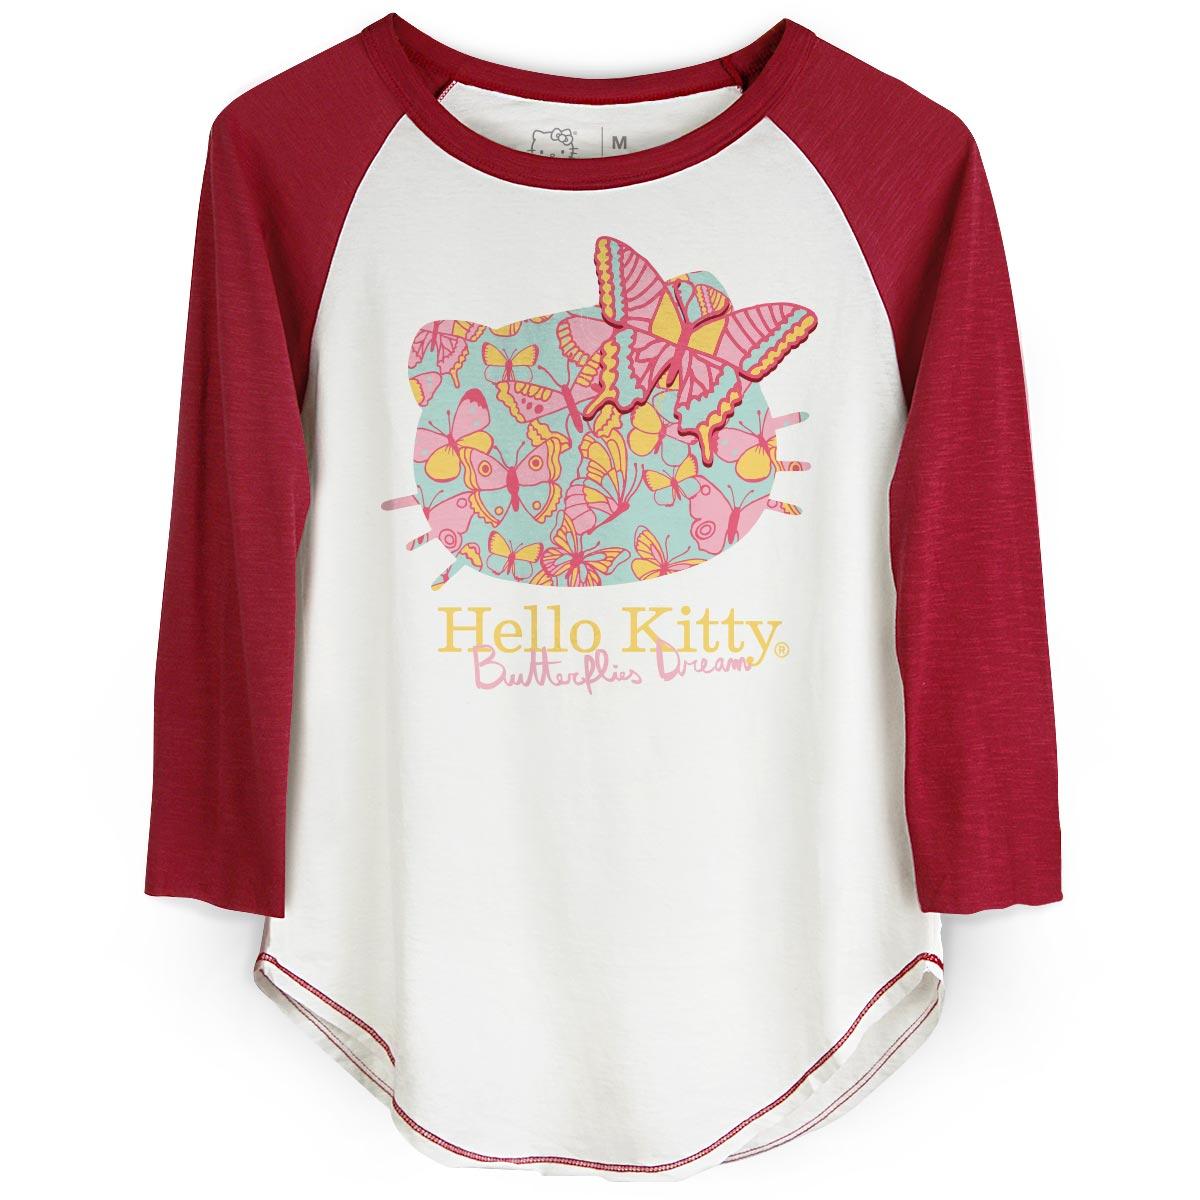 Camiseta Manga Longa Feminina Hello Kitty Butterflies Dream Face